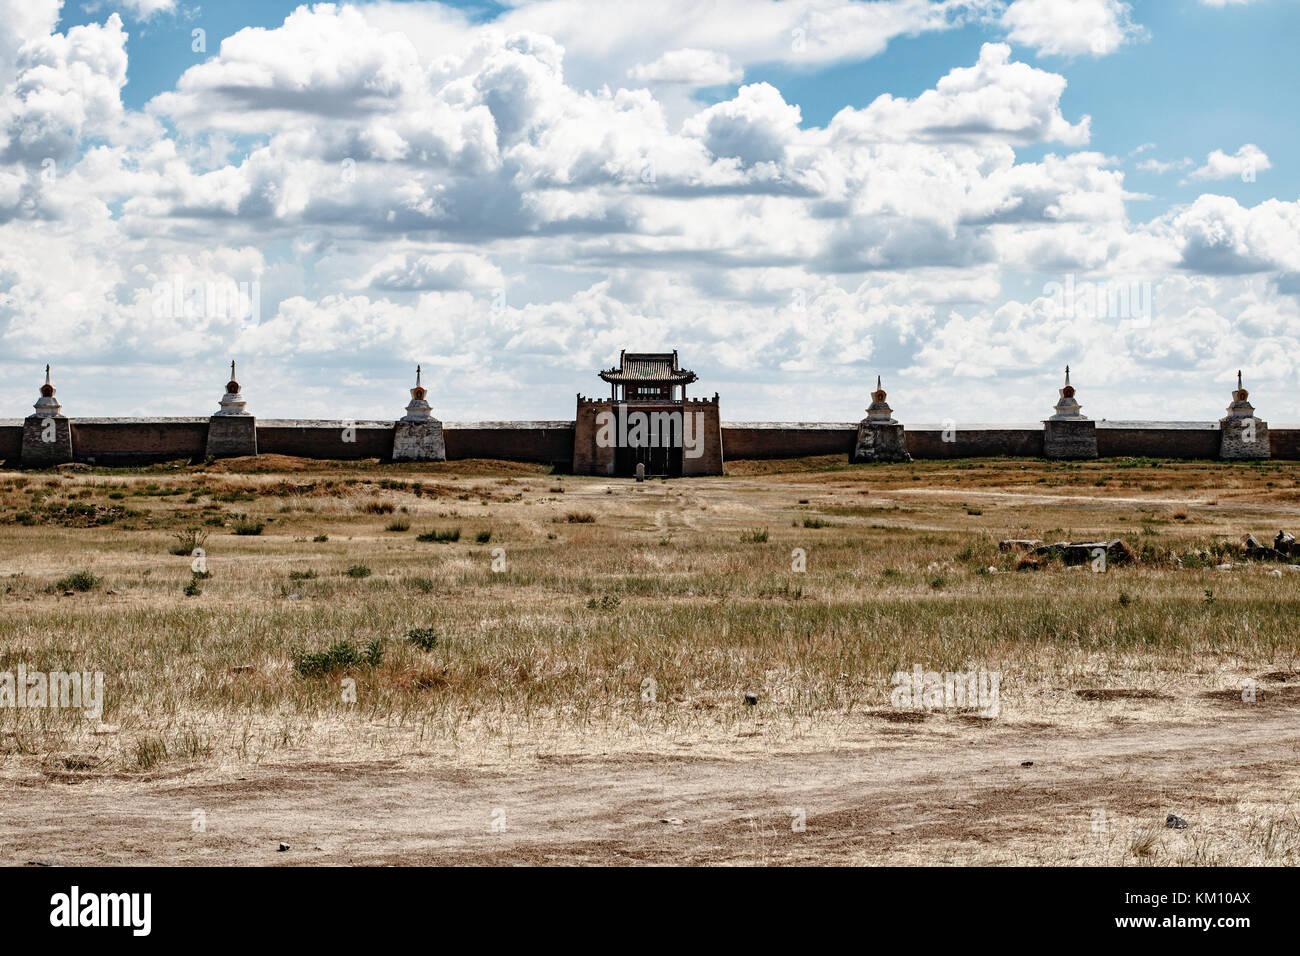 Monastery temple in Karakorum, capital of the mongolian empire Stock Photo